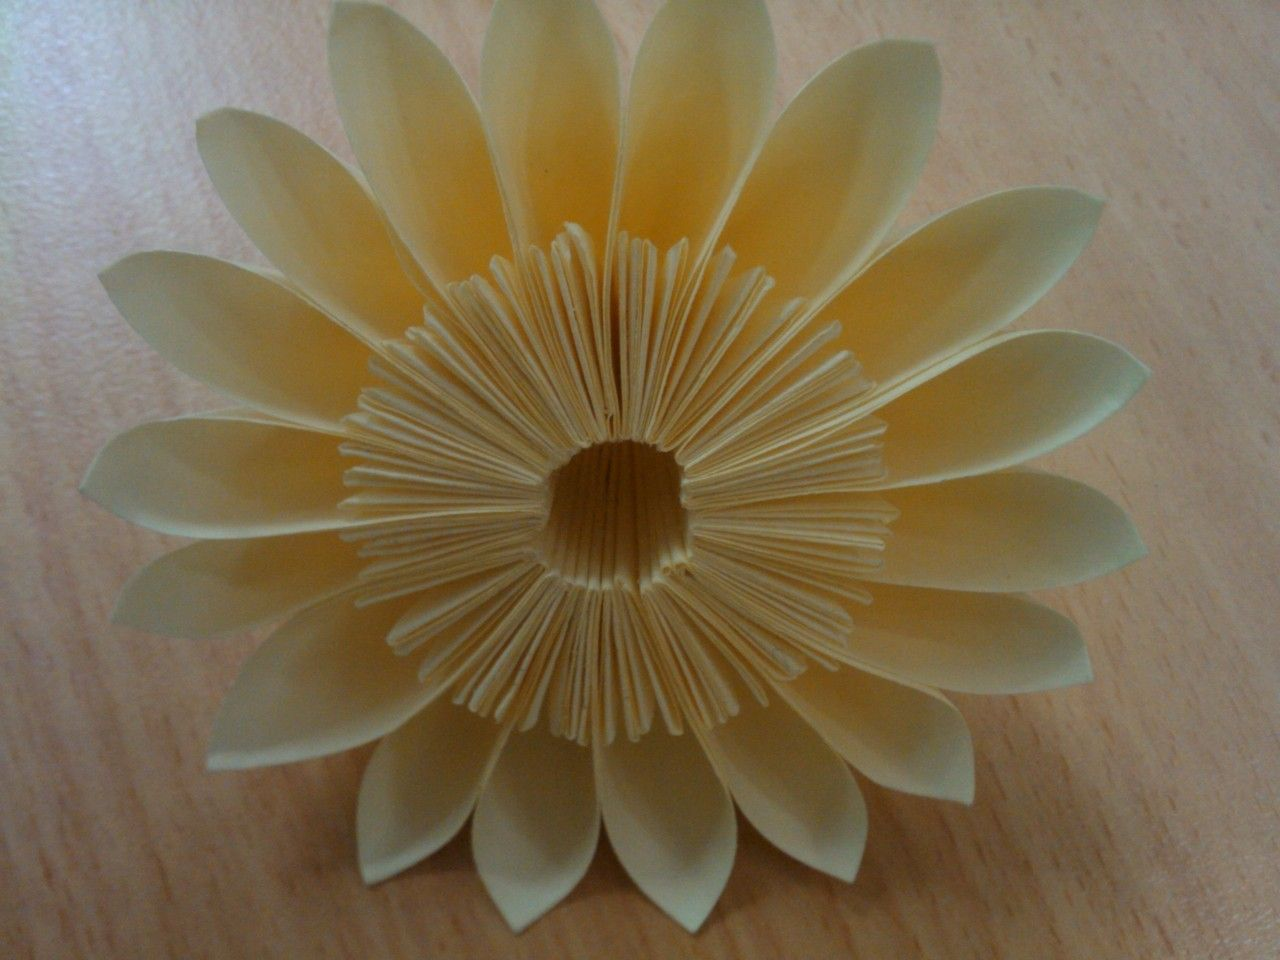 Sticky note origami flower crafts pinterest origami origami sticky note origami flower mightylinksfo